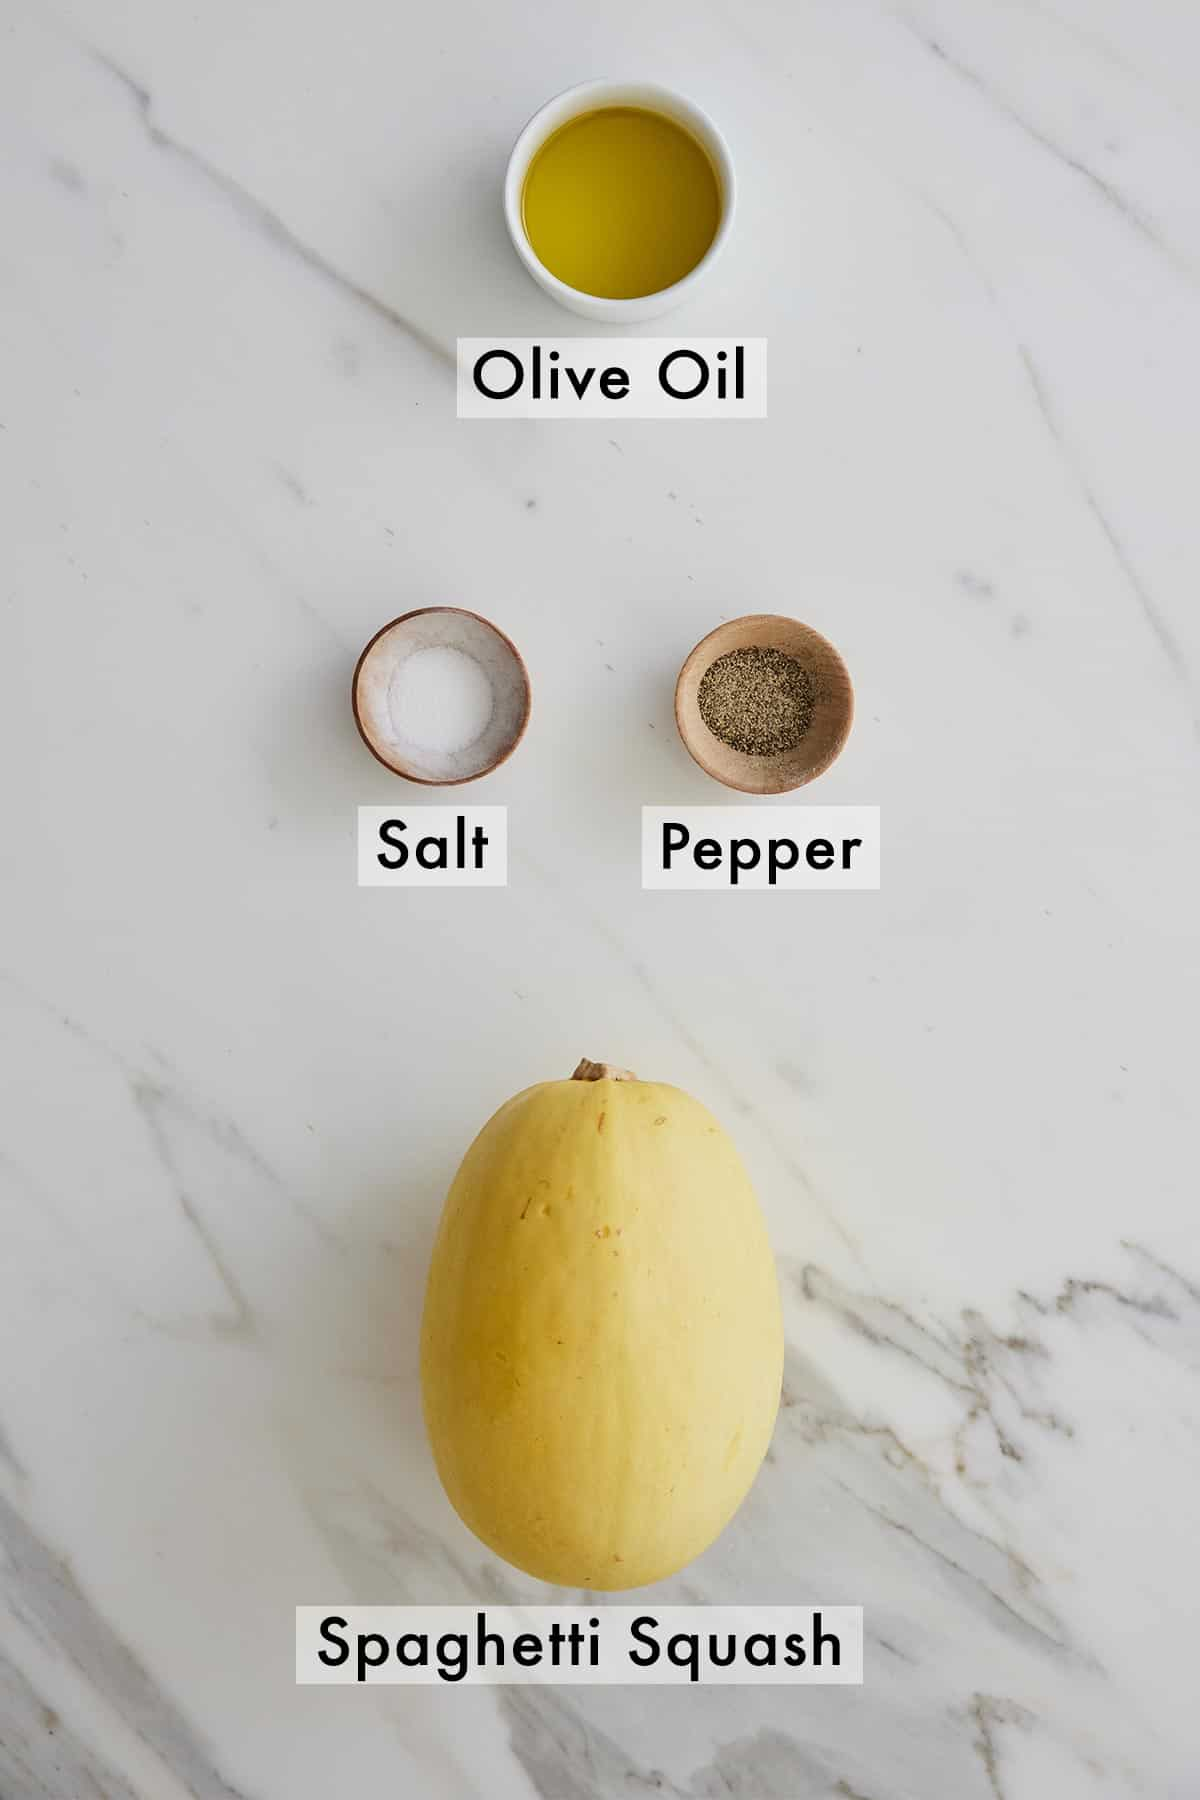 Ingredients needed to make spaghetti squash.